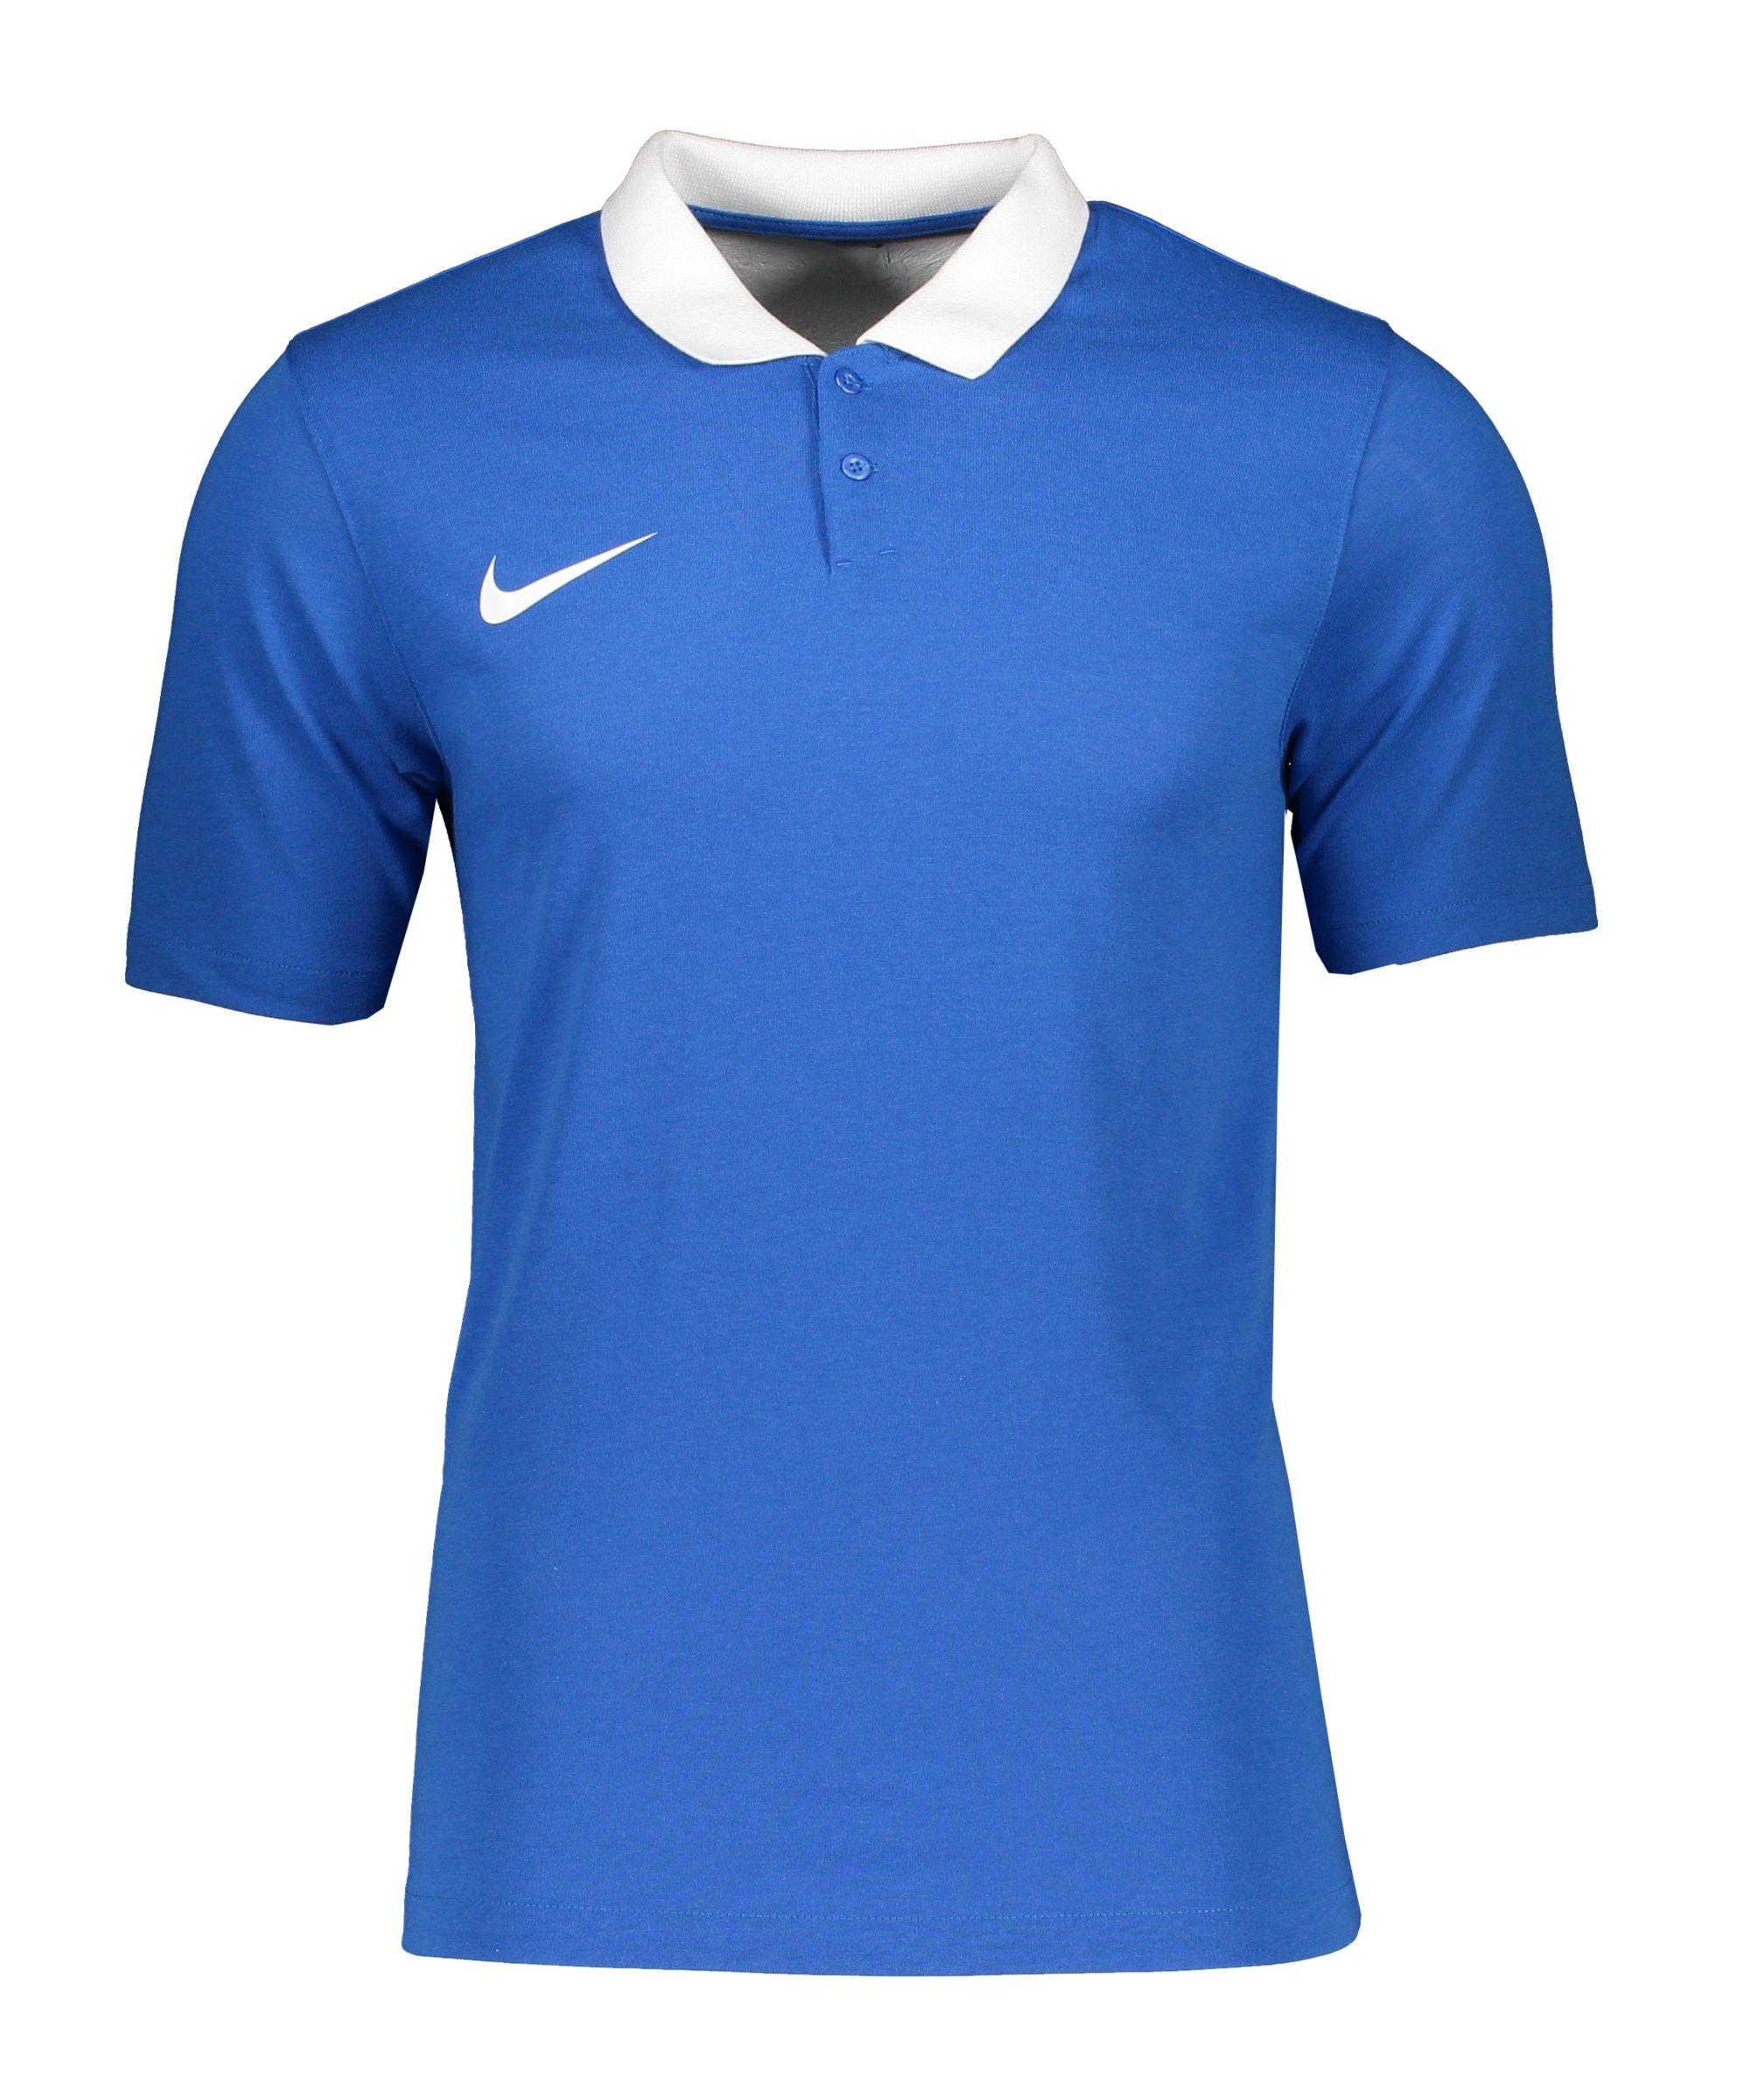 Nike Park 20 Poloshirt Blau Weiss F463 - blau